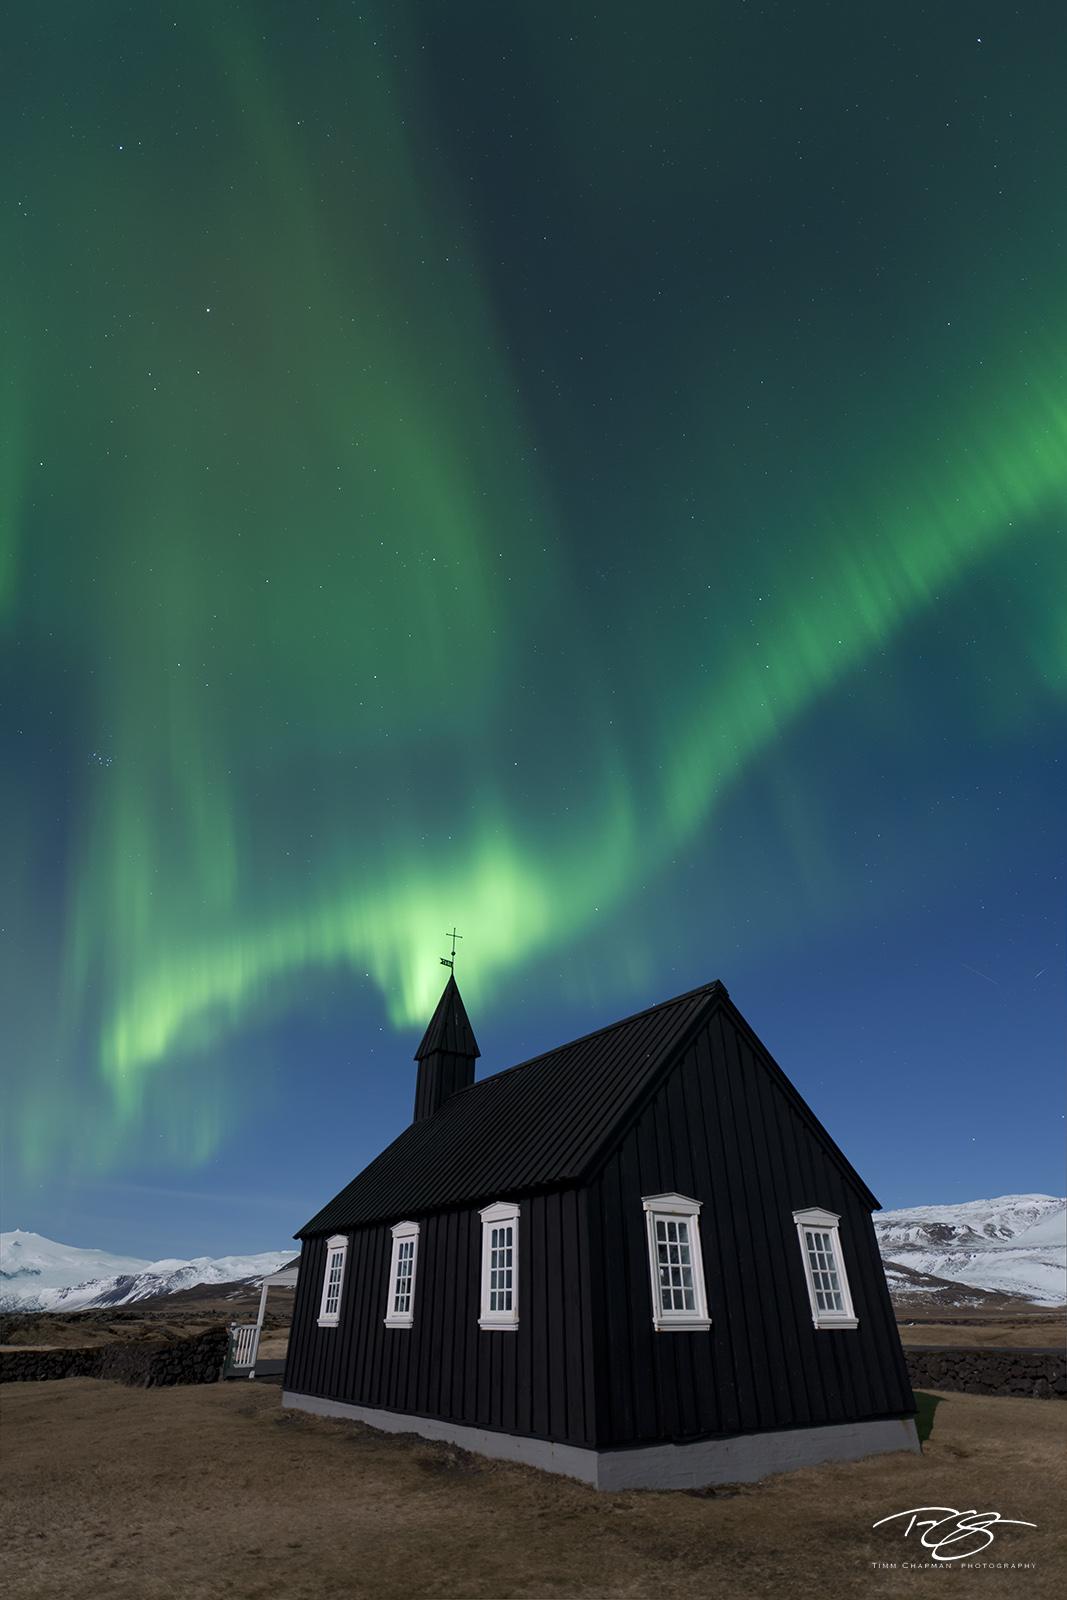 Iceland, aurora, borealis, green, violet, stars, northern lights, ribbon, spirit, coronal mass ejection, solar flare, energy, nordic, arctic, church, black, budir, Búðir, cross, steeple, small church, photo